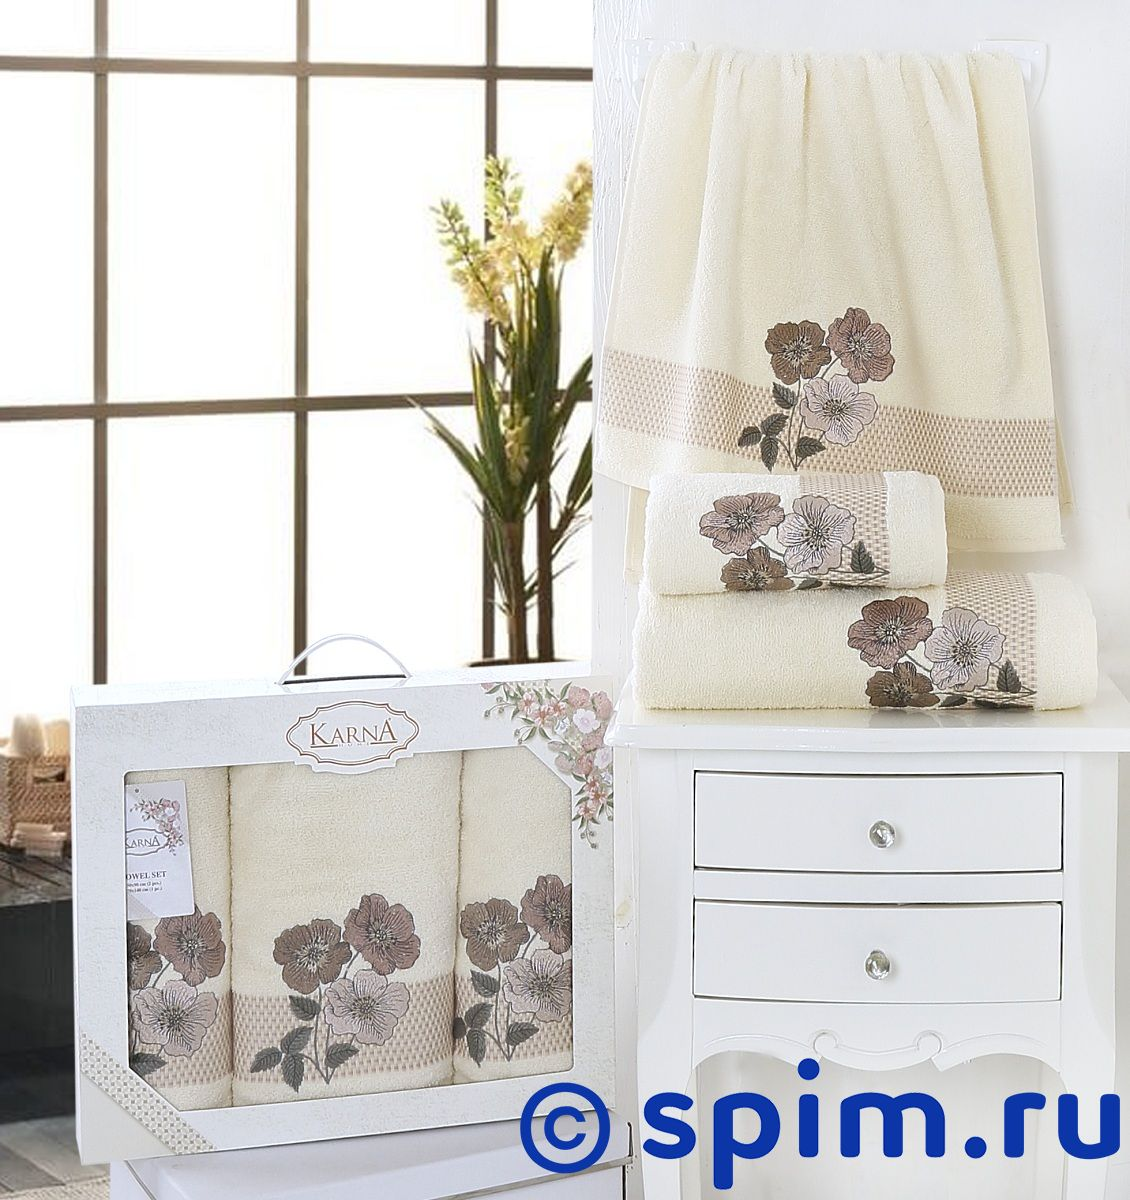 Комплект полотенец Karna Sandy, кремовый арт. 2391/char002 комплект полотенец karna victory бордовый арт 2386 char002